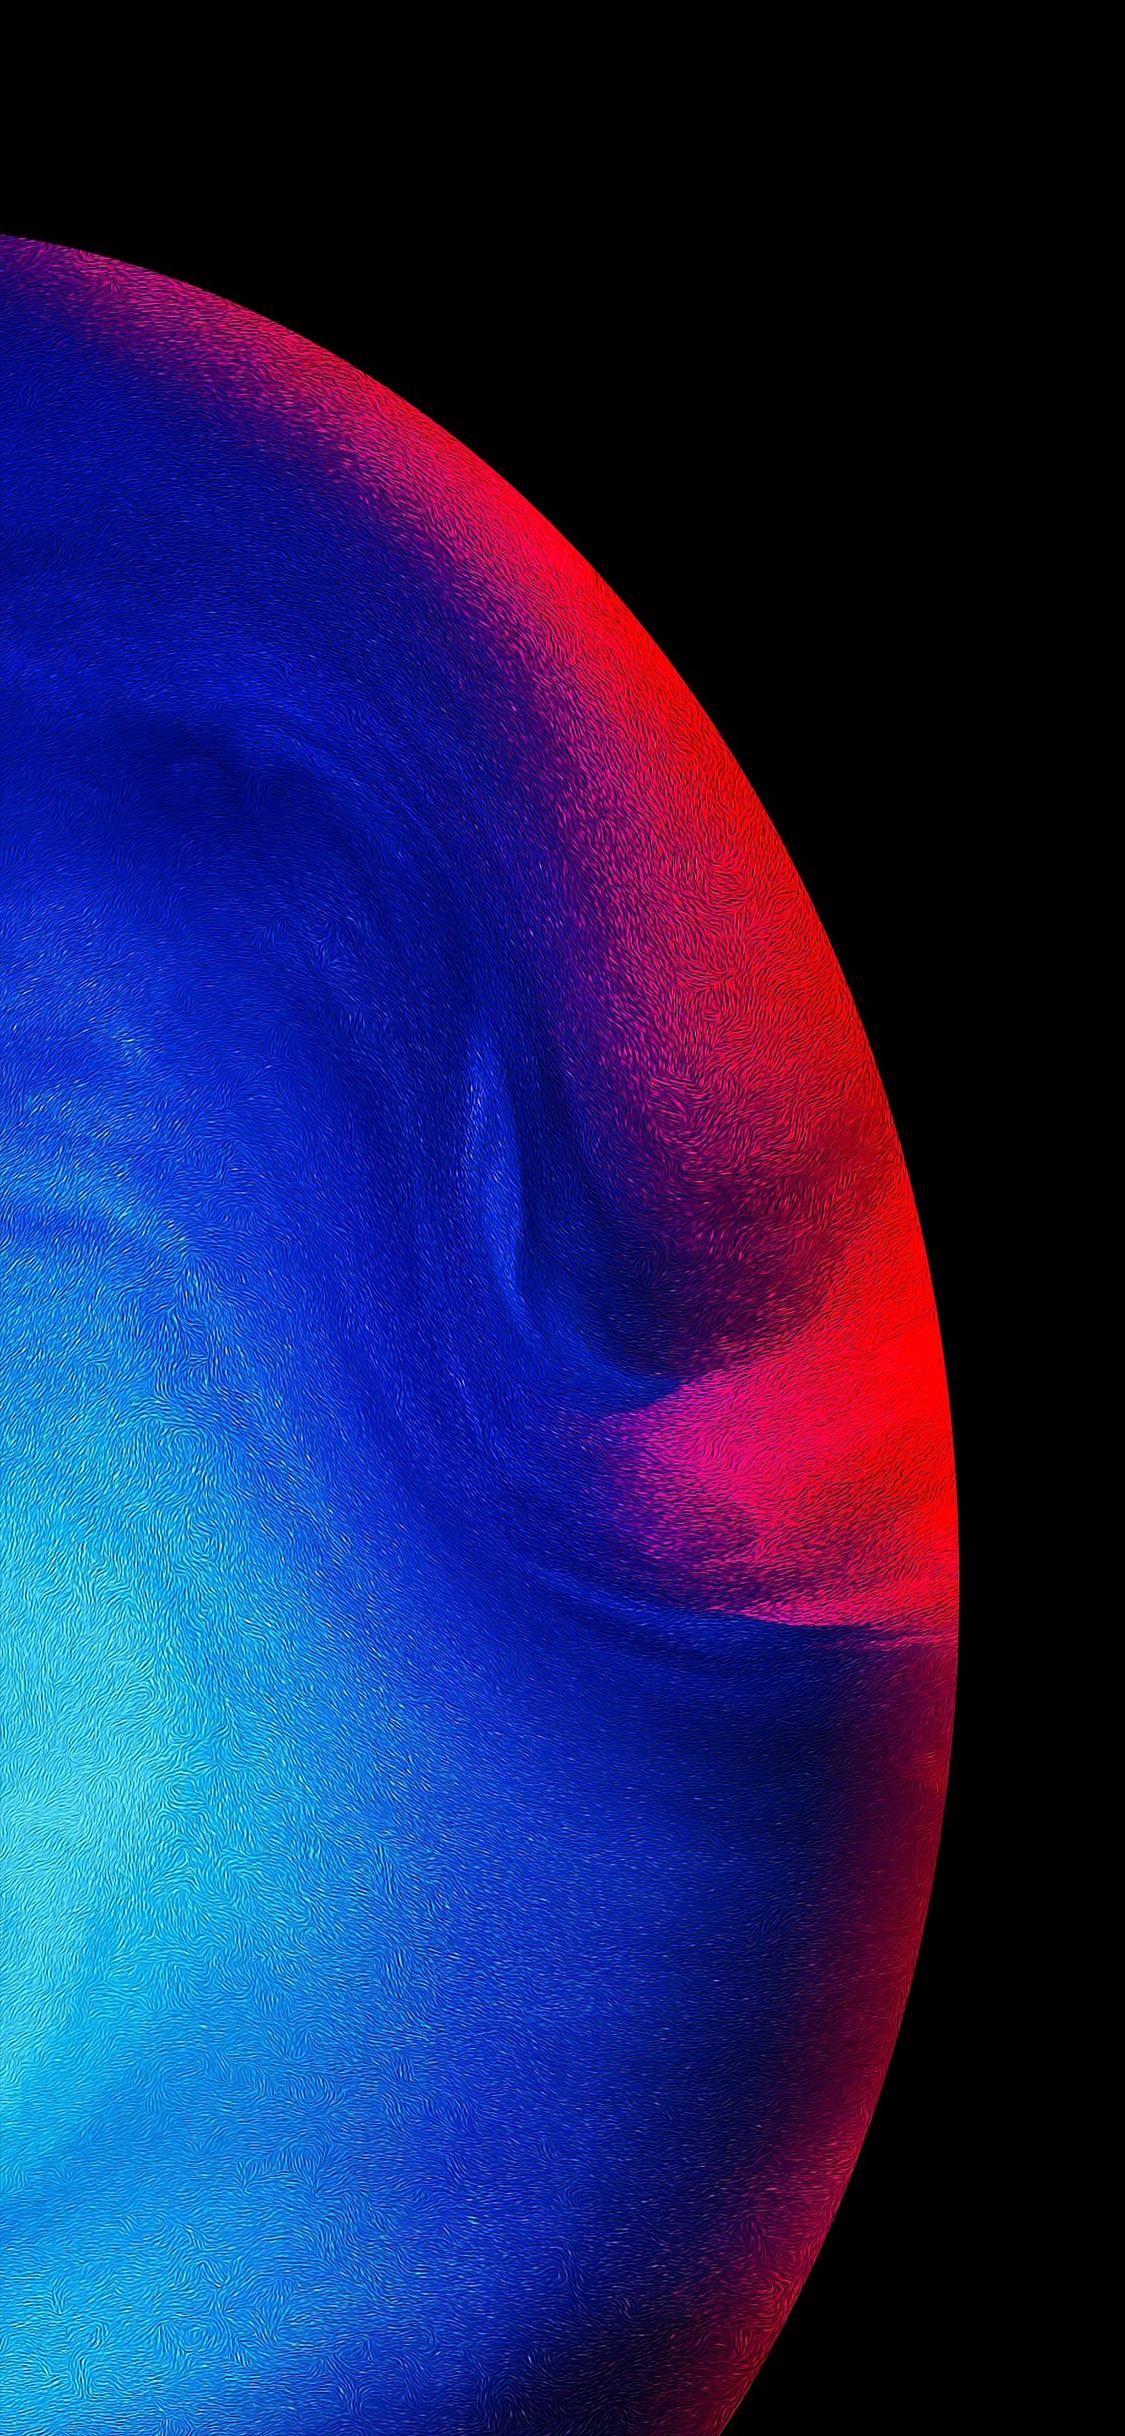 Moon Neptune iPhone X Wallpapers iphonexwallpaperfullhd